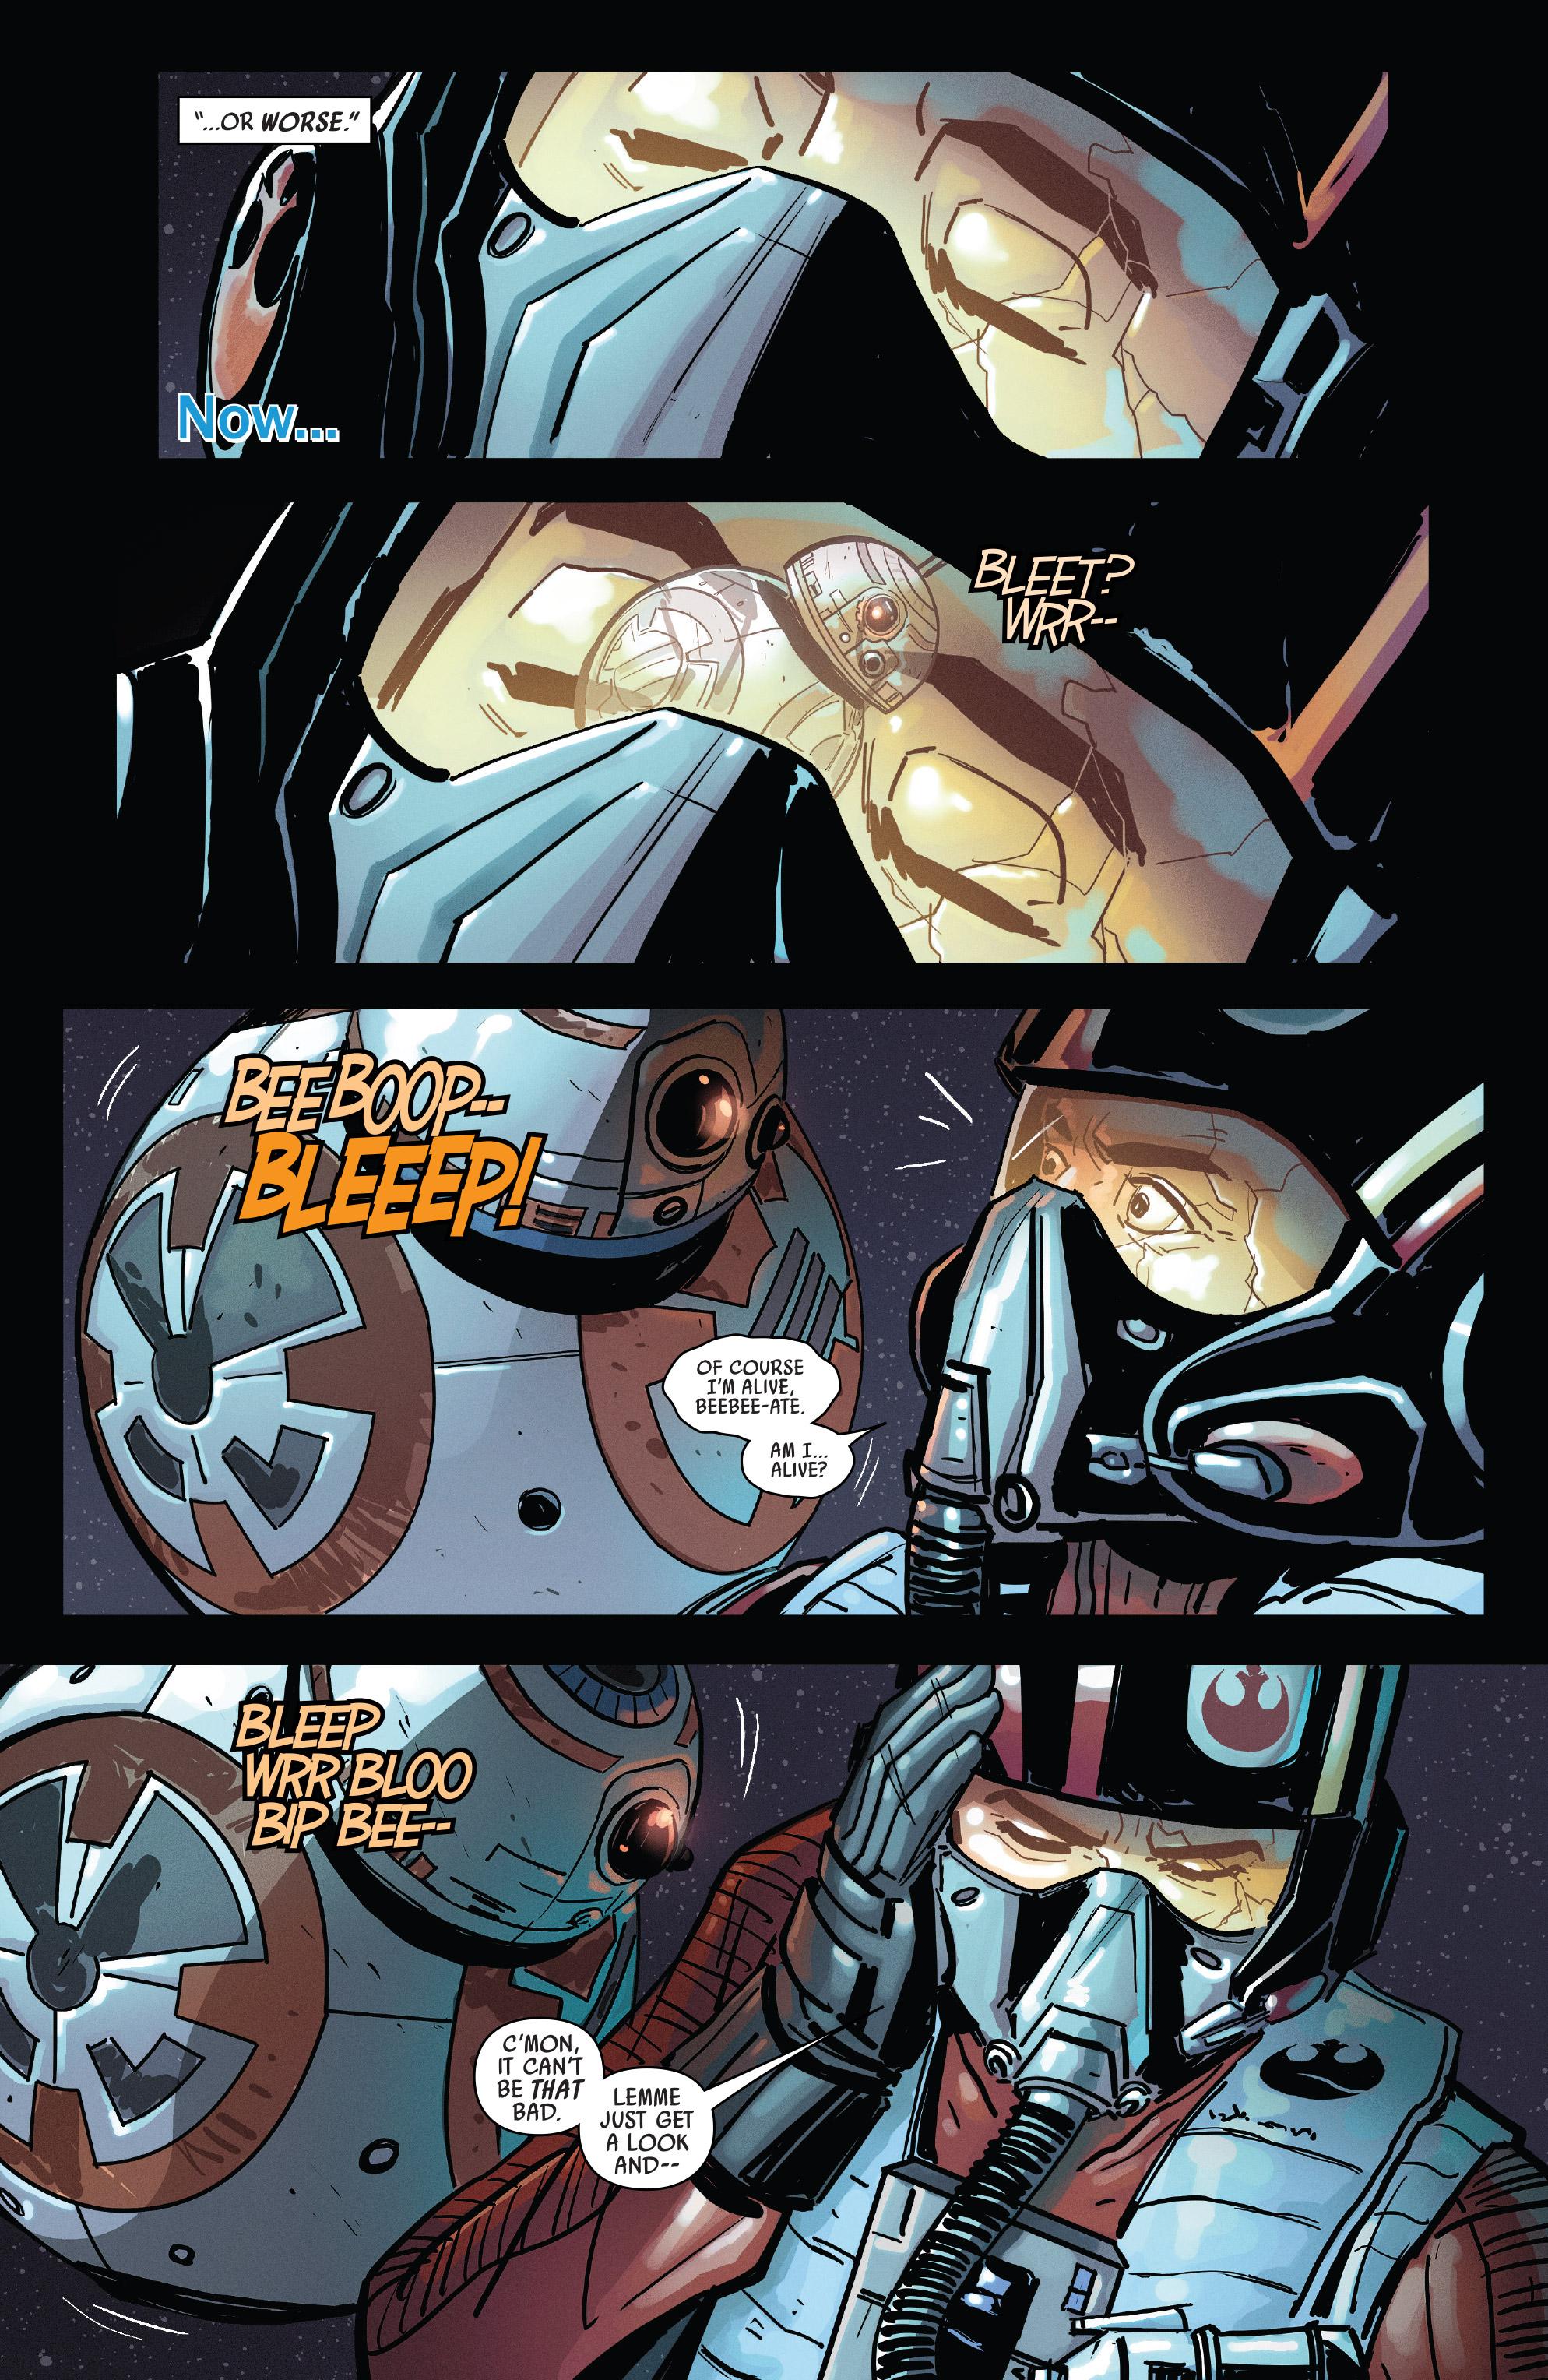 Read online Star Wars: Poe Dameron comic -  Issue # _Annual 1 - 5